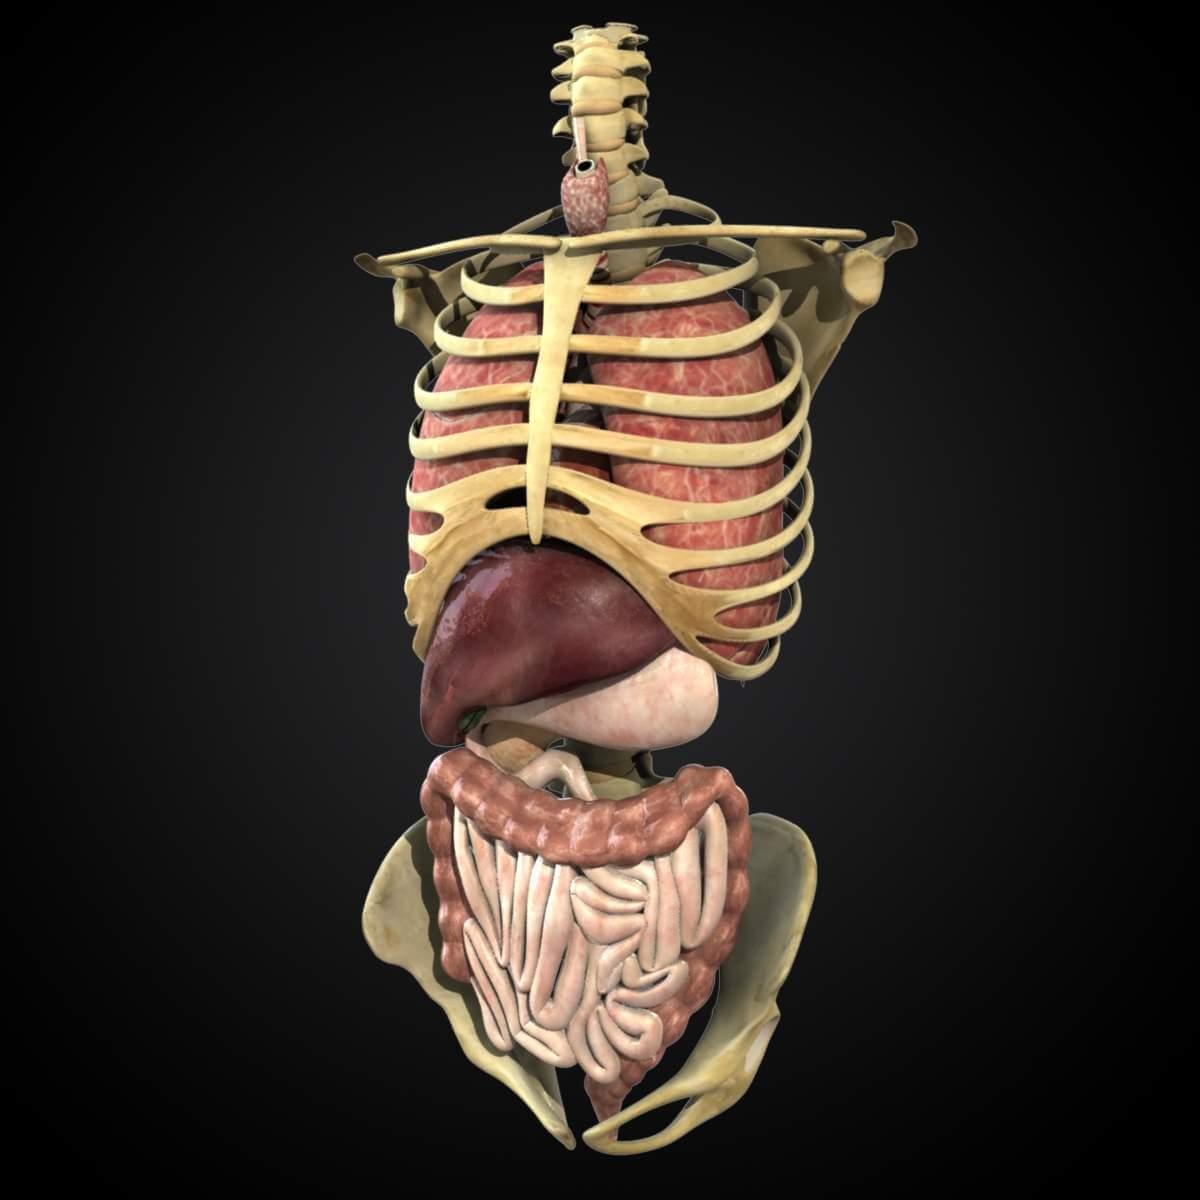 Human Anatomy Study Torso 3d Model